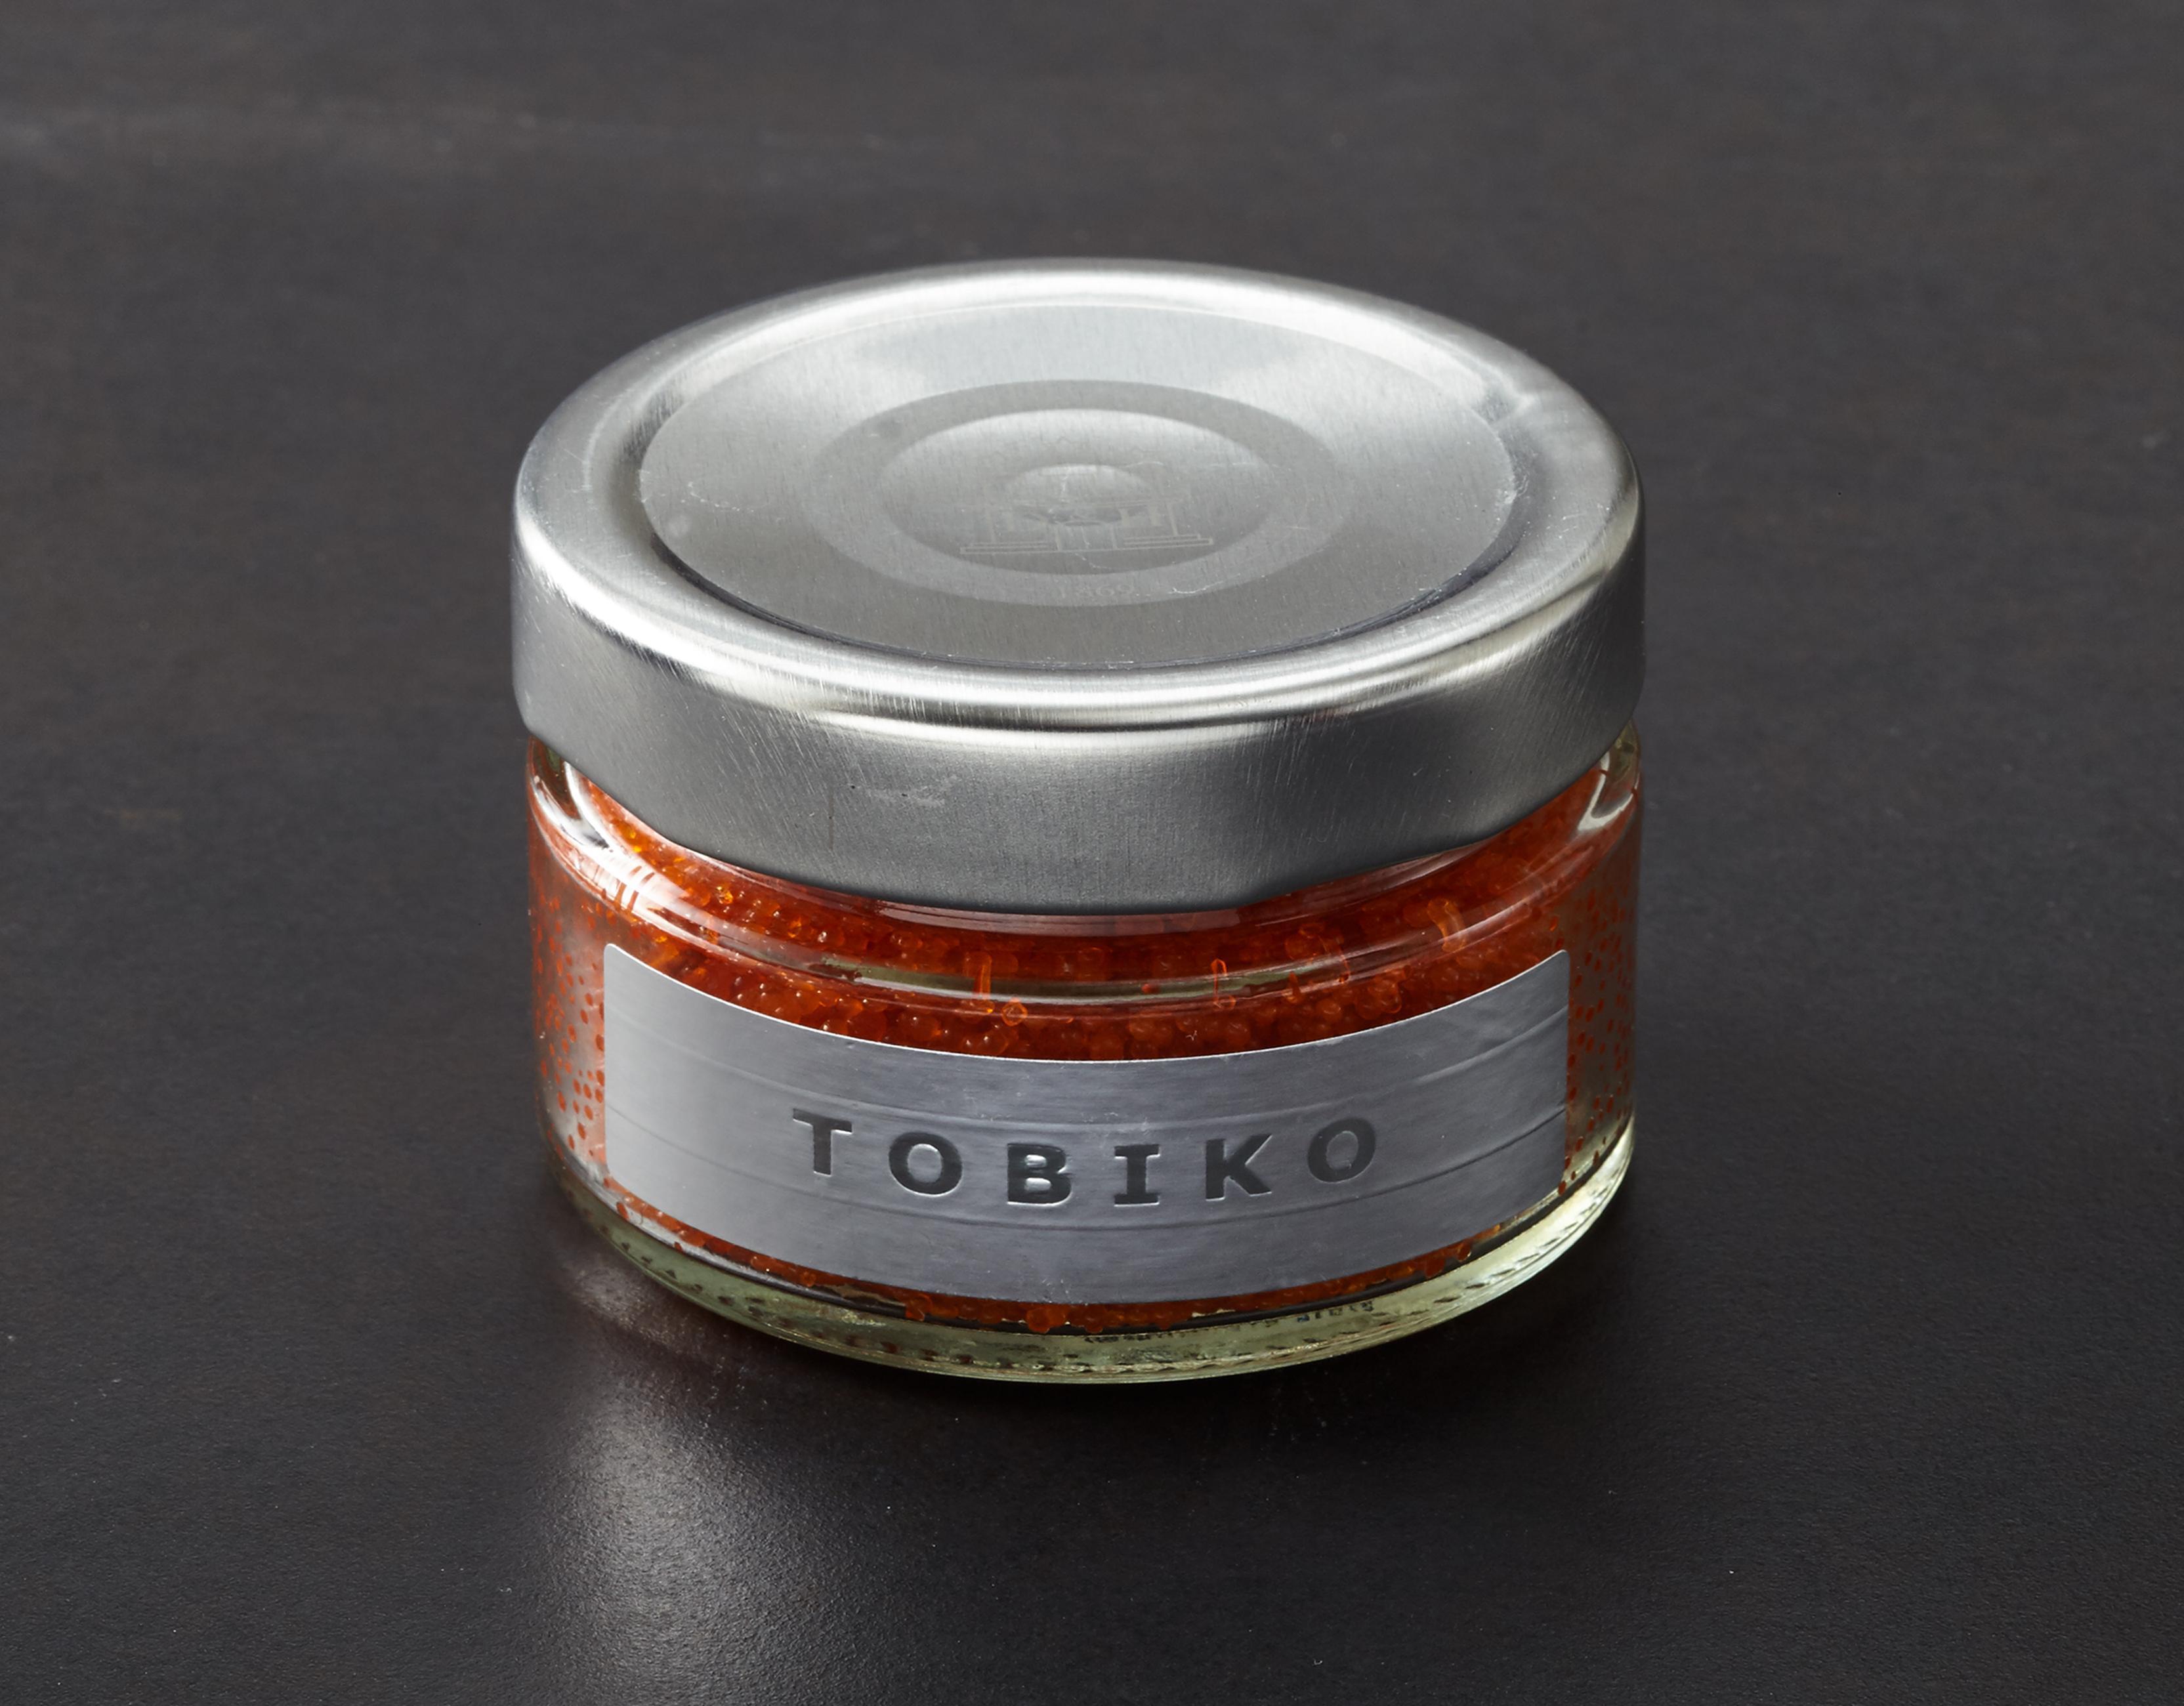 Kaviar · Tobiko (Orange) jetzt kaufen!